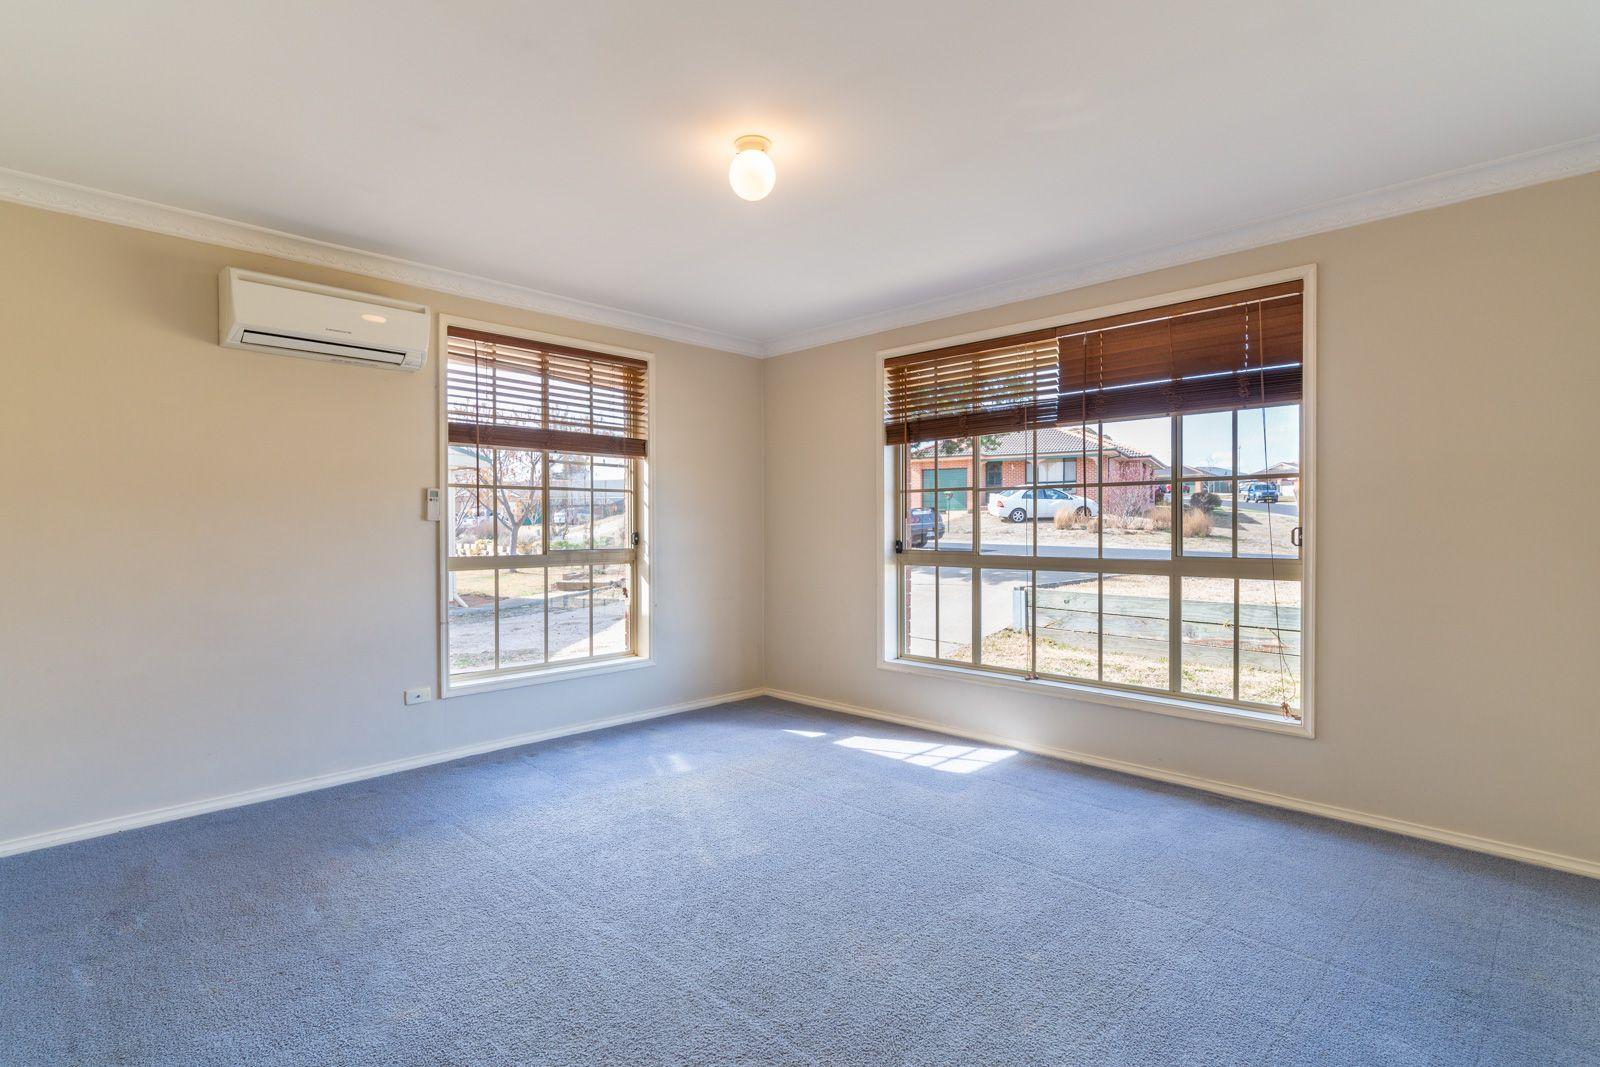 5 Sundown Drive, Kelso NSW 2795, Image 1